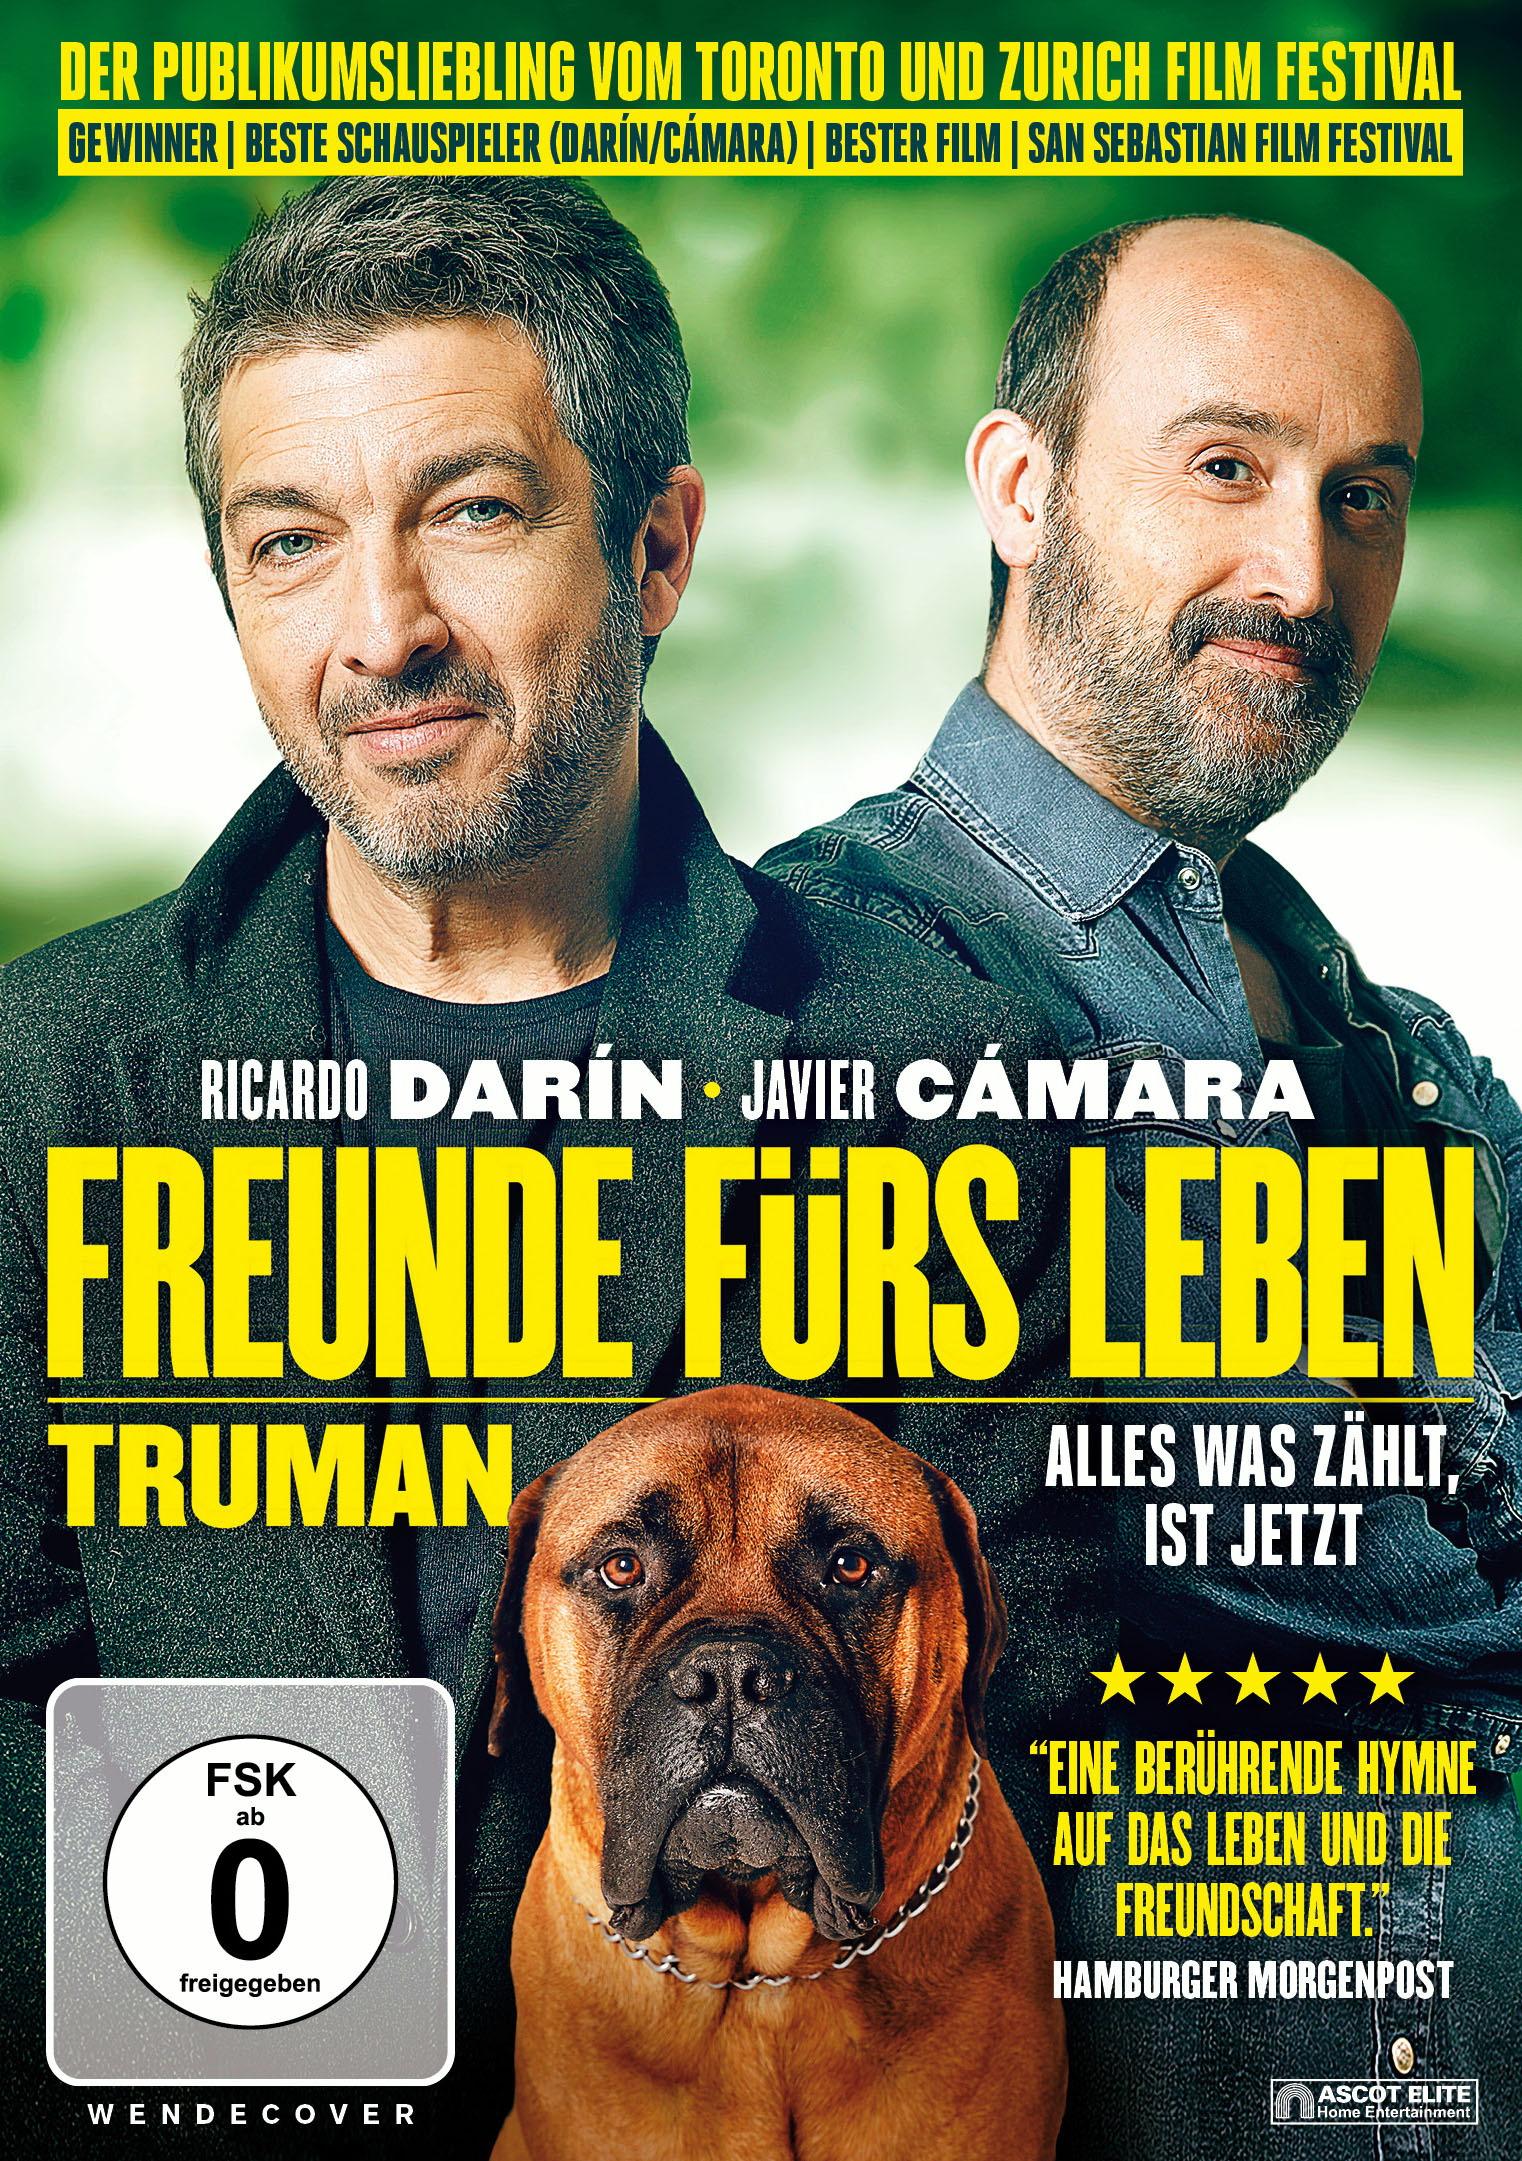 Freunde fürs Leben - Truman Poster